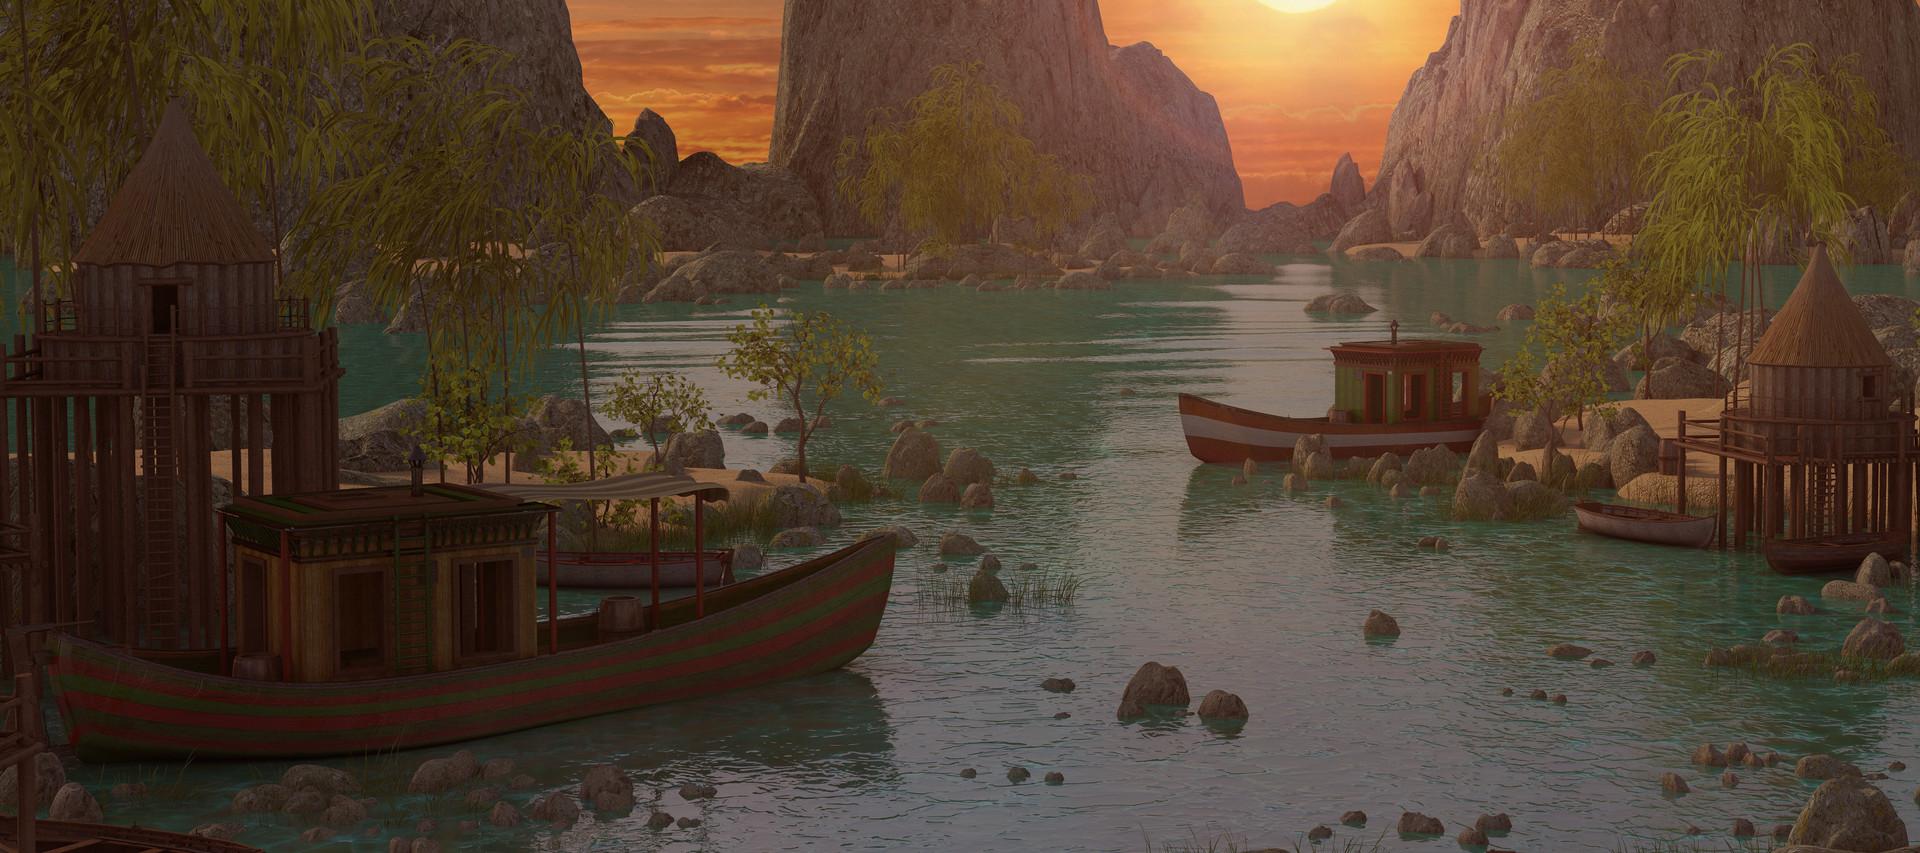 Marc mons vietnam9